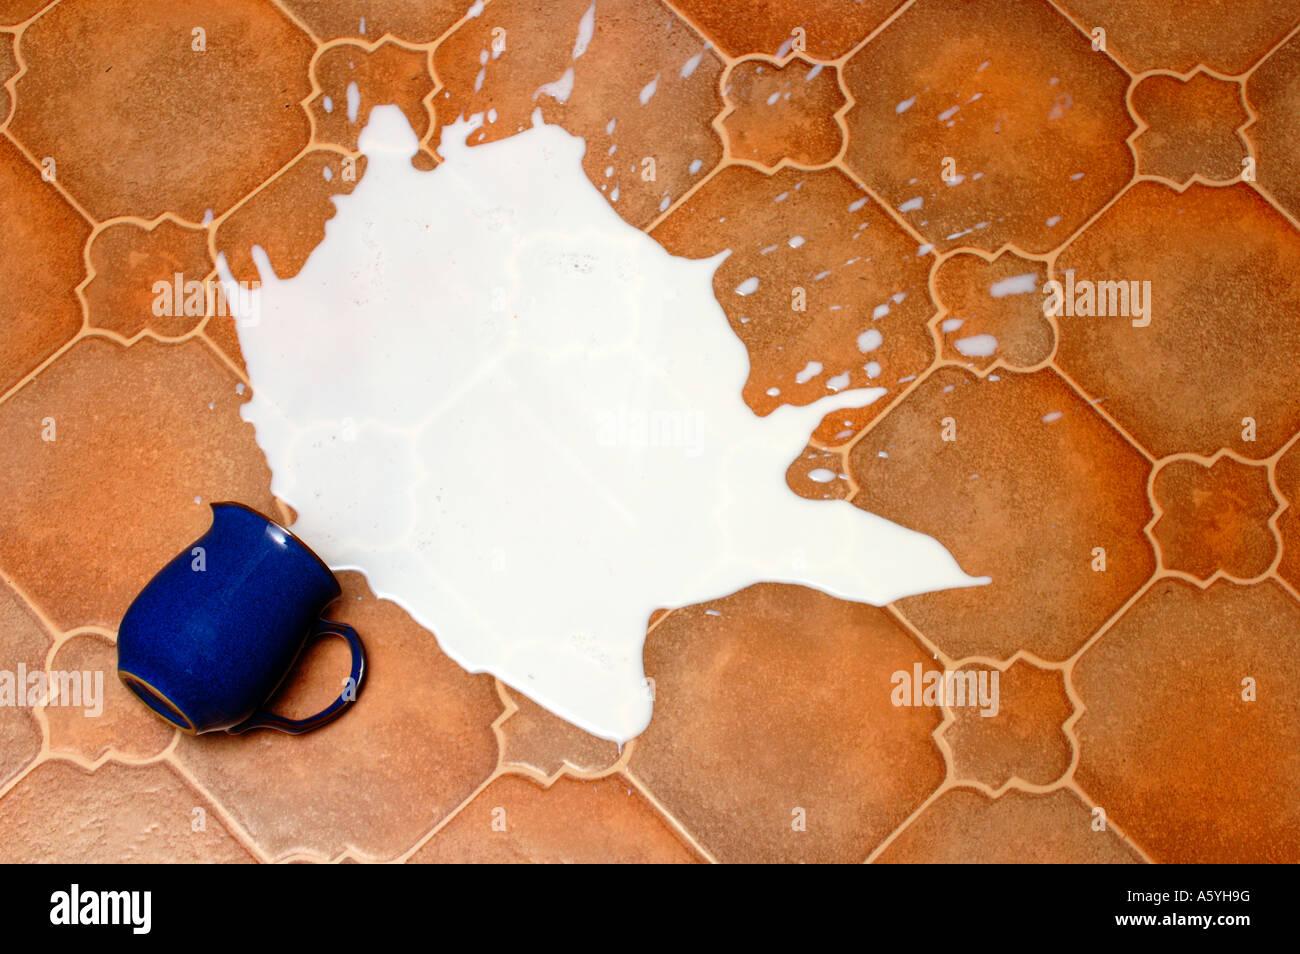 Spill Milk Accident Stock Photos & Spill Milk Accident